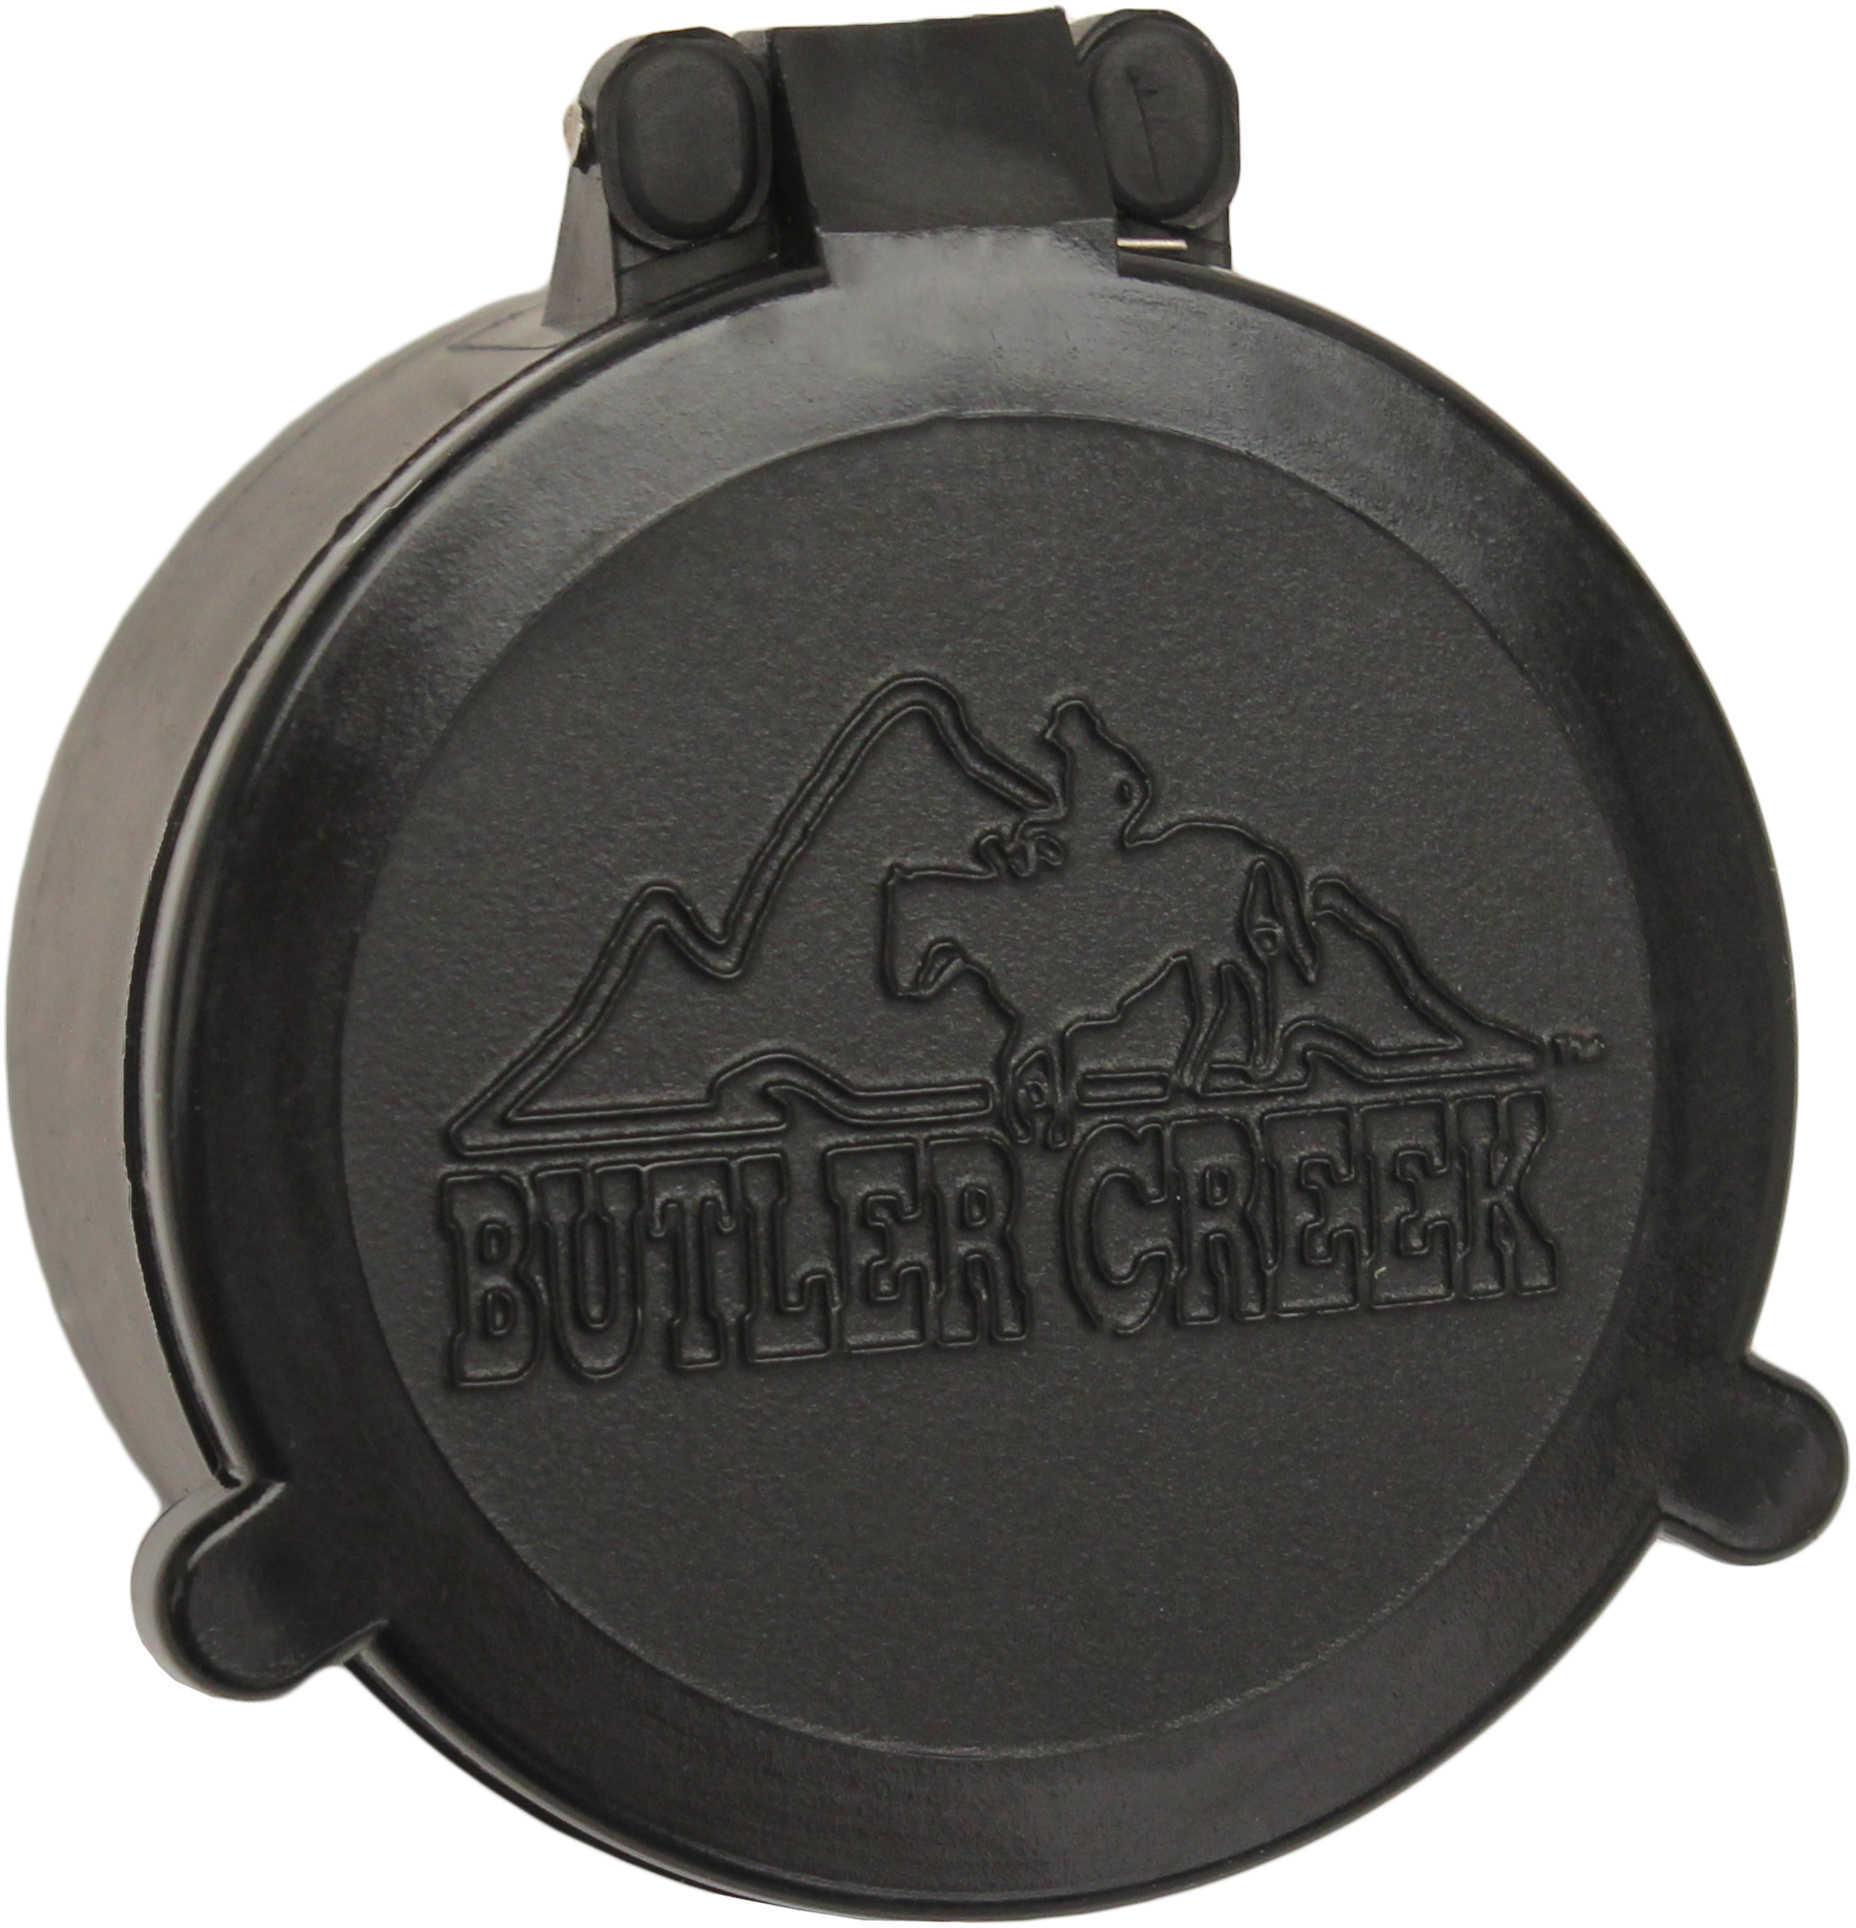 Butler Creek Flip Open Scope Cover - Objective Size 19 Md: 30190